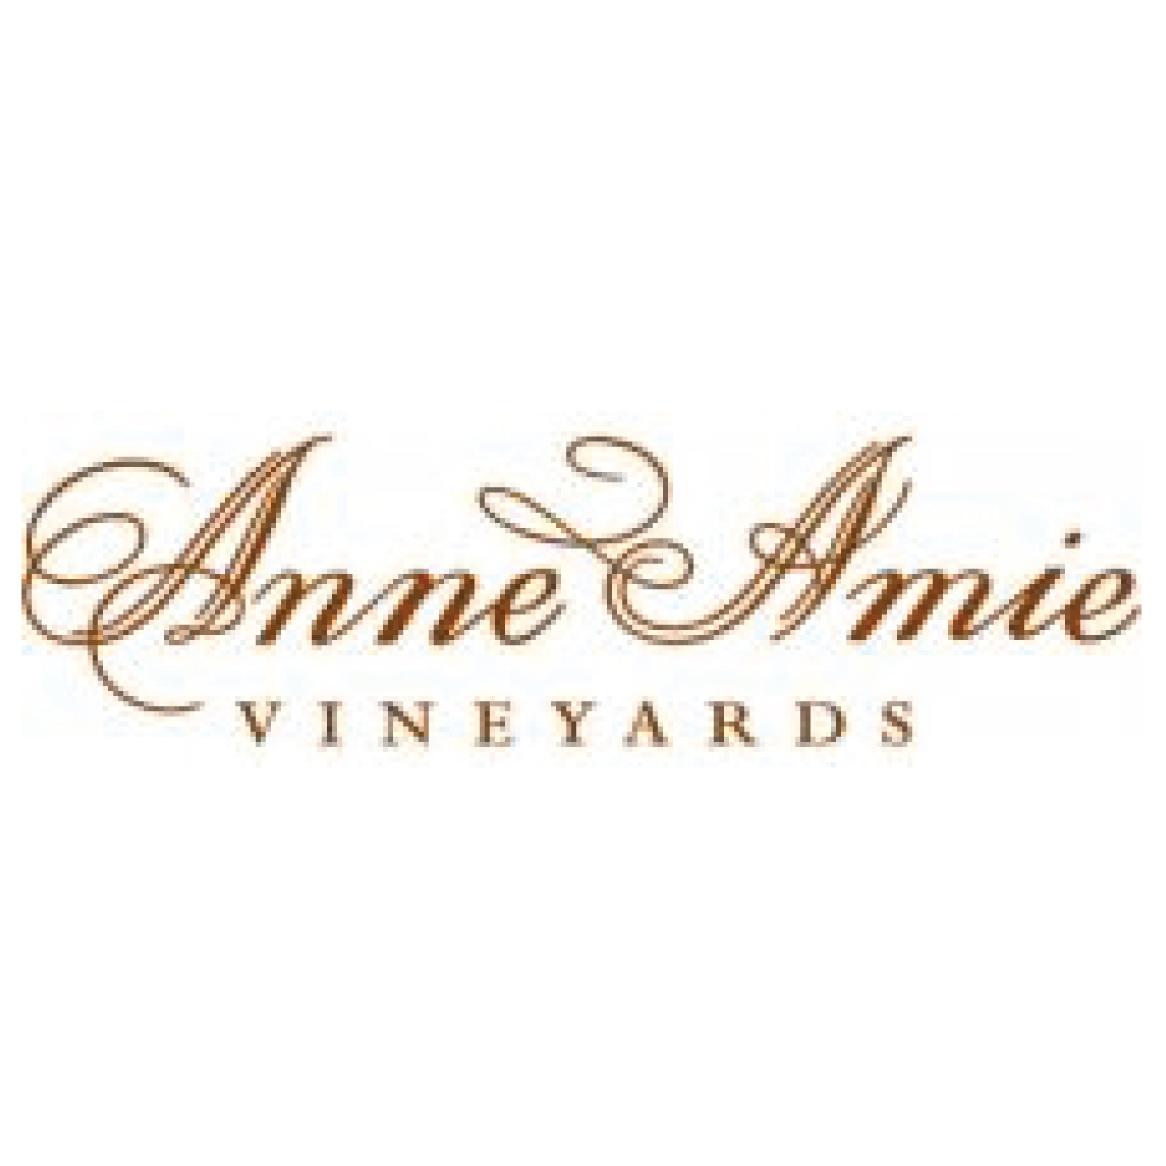 Anne+Amie-01.jpg